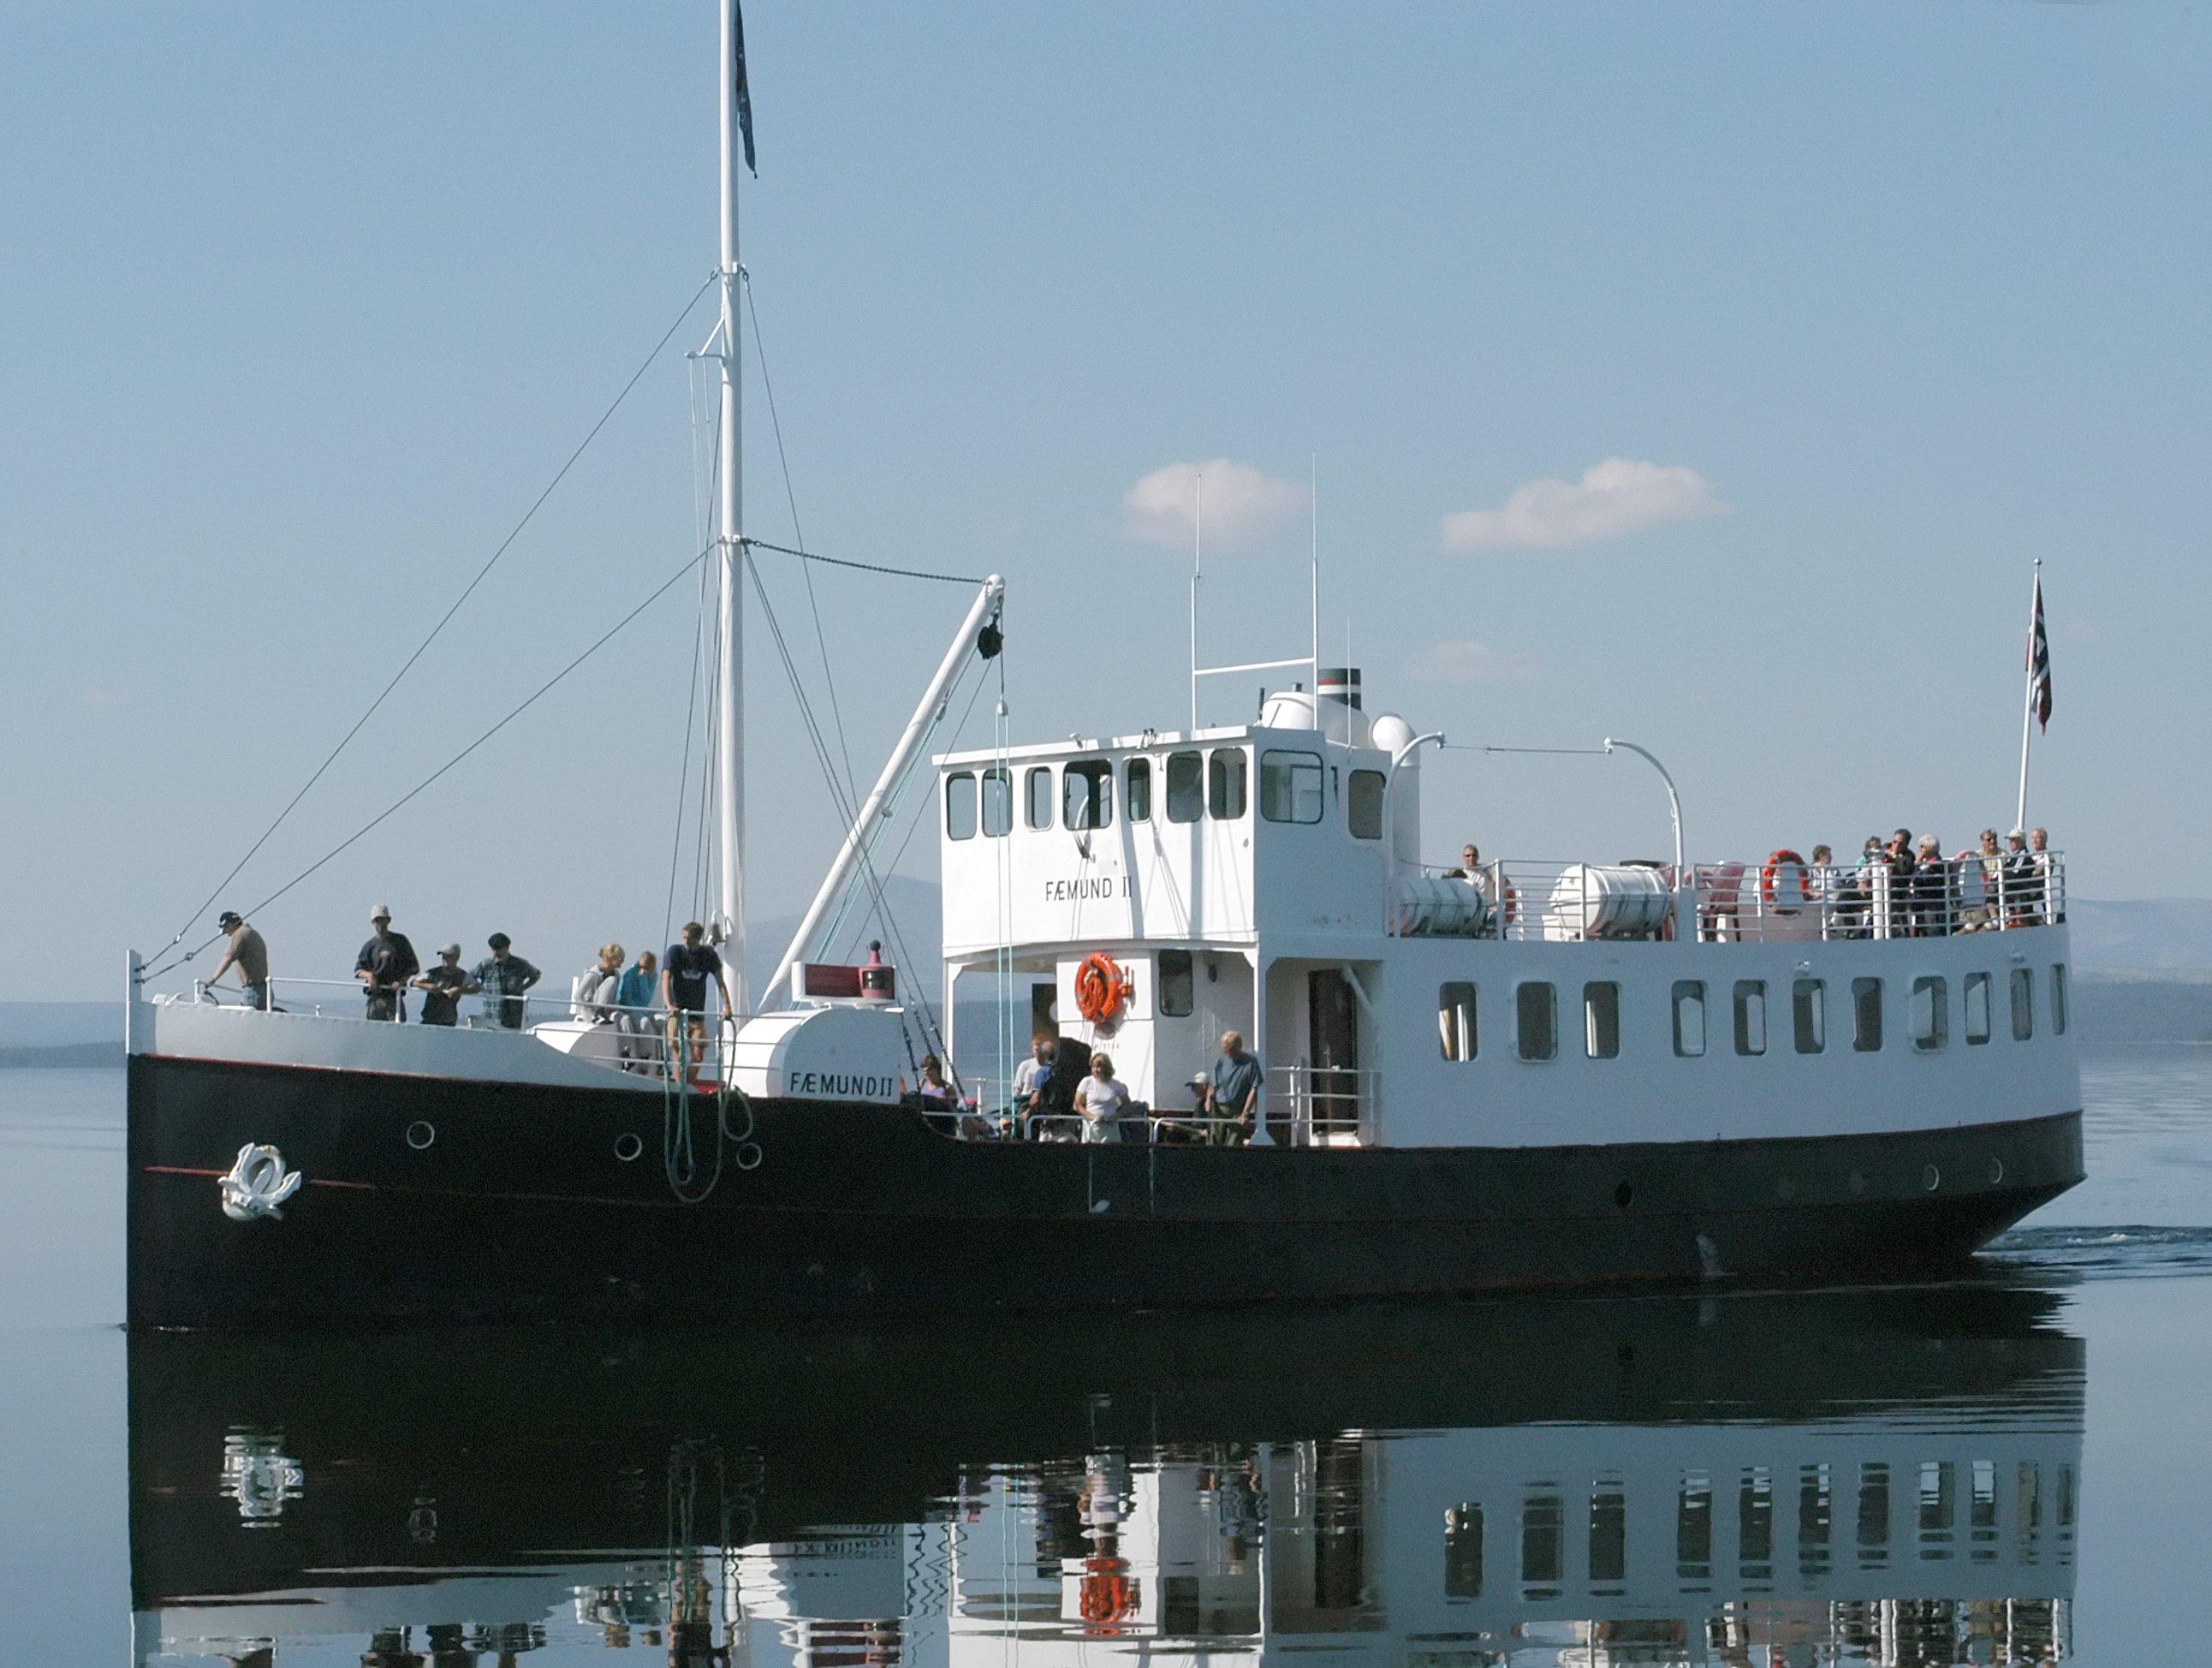 The ferry «Fæmund II» in 2004. | Photo: Dr. Mirko Junge - wikimedia.org cc by-sa.